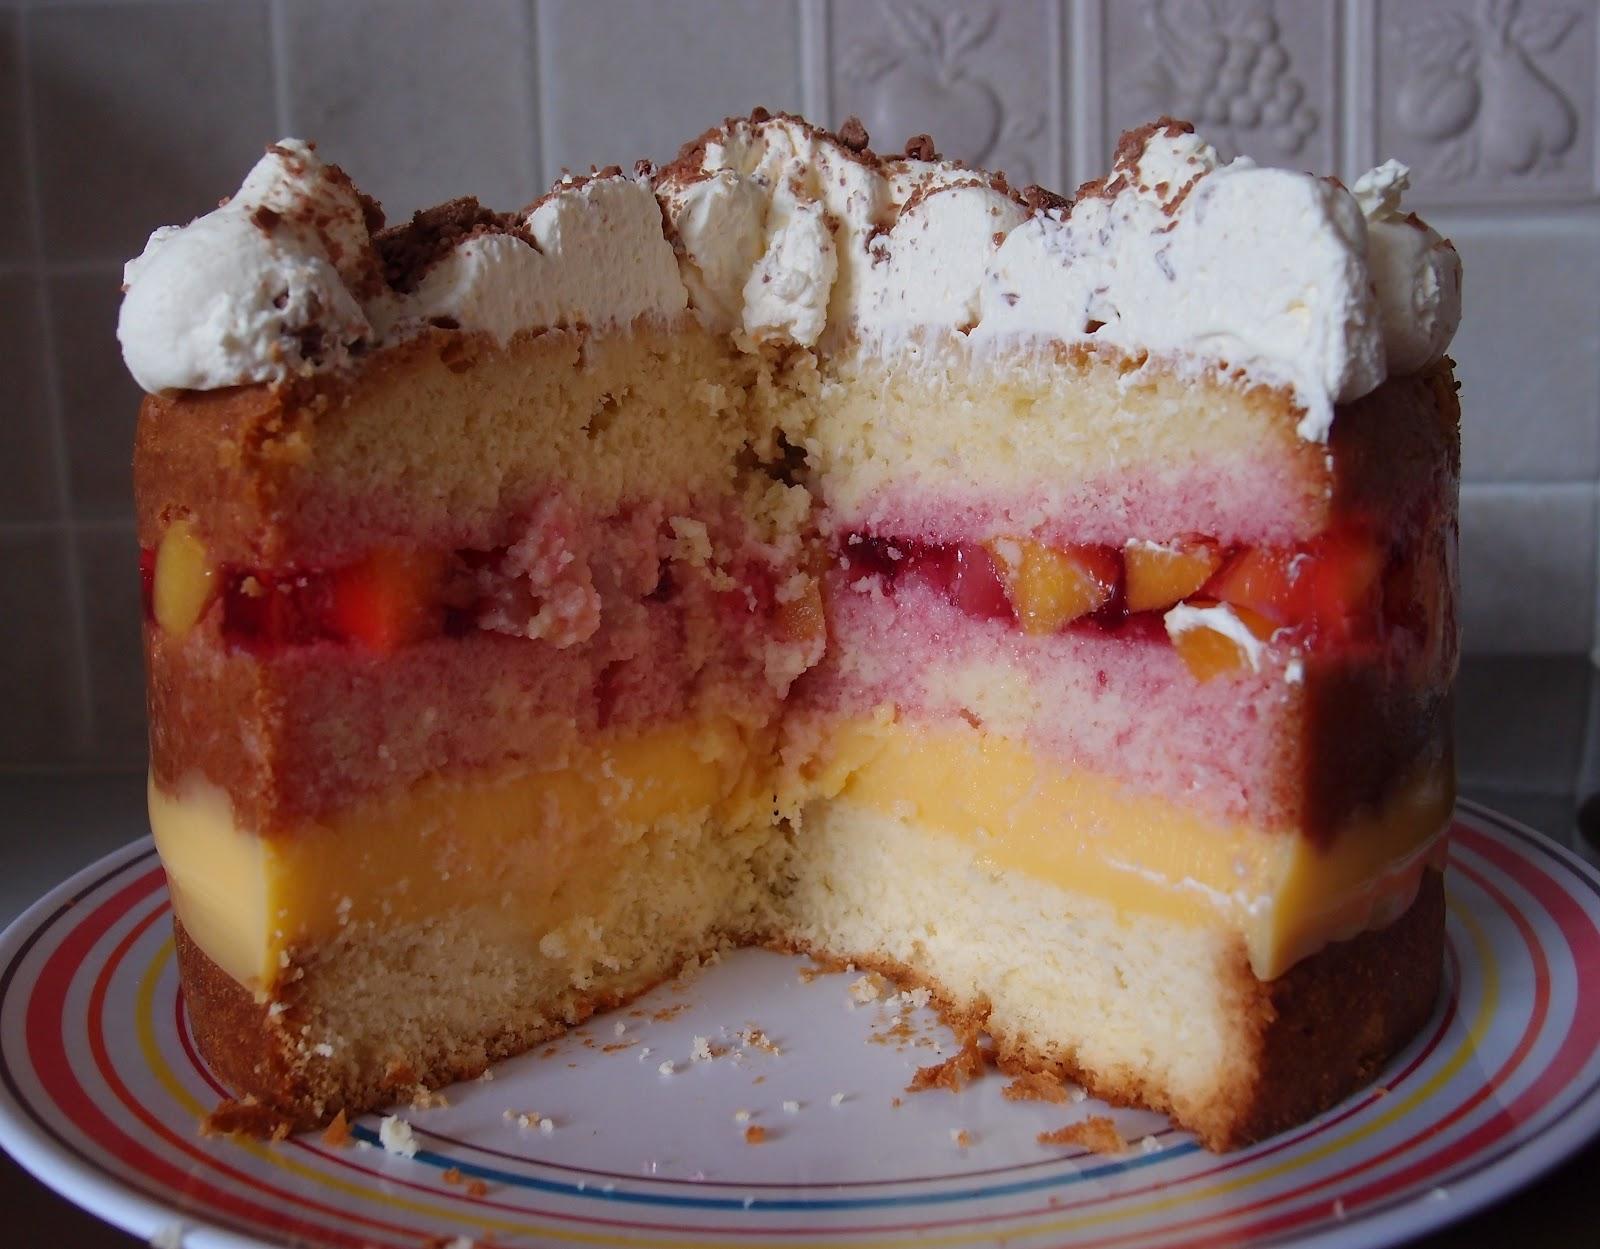 Fruit And Jelly Cake Recipe: The Caked Crusader: Trifle Sponge Cake